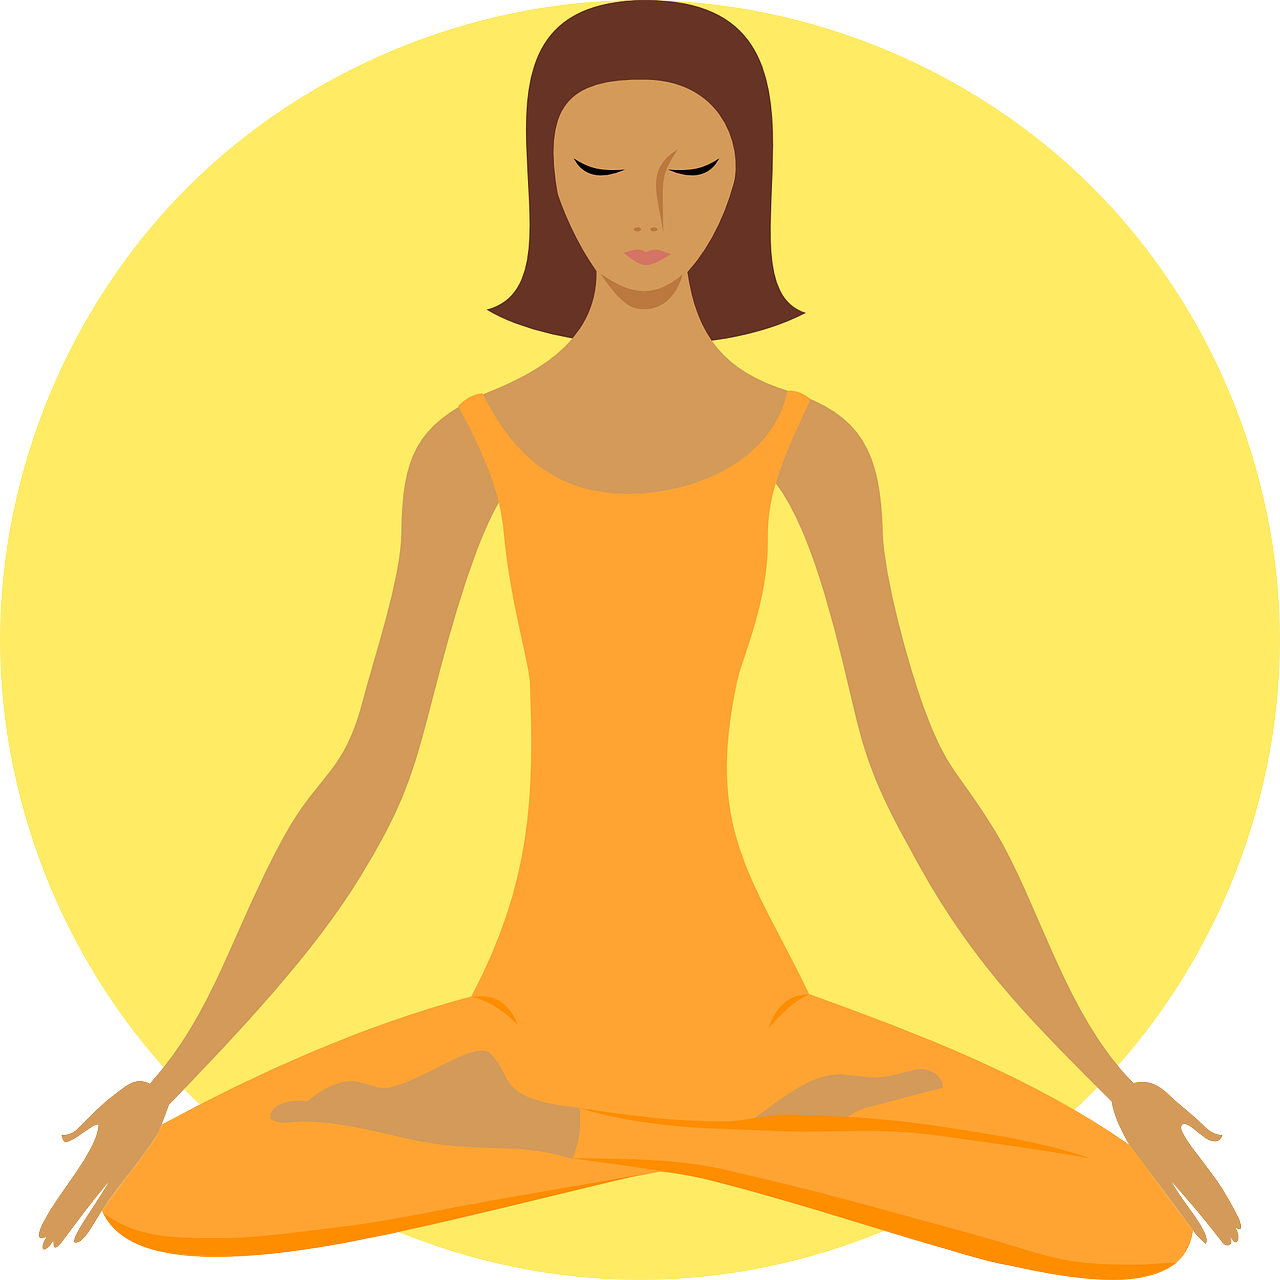 Meditation png image purepng. Clothing clipart buddhist